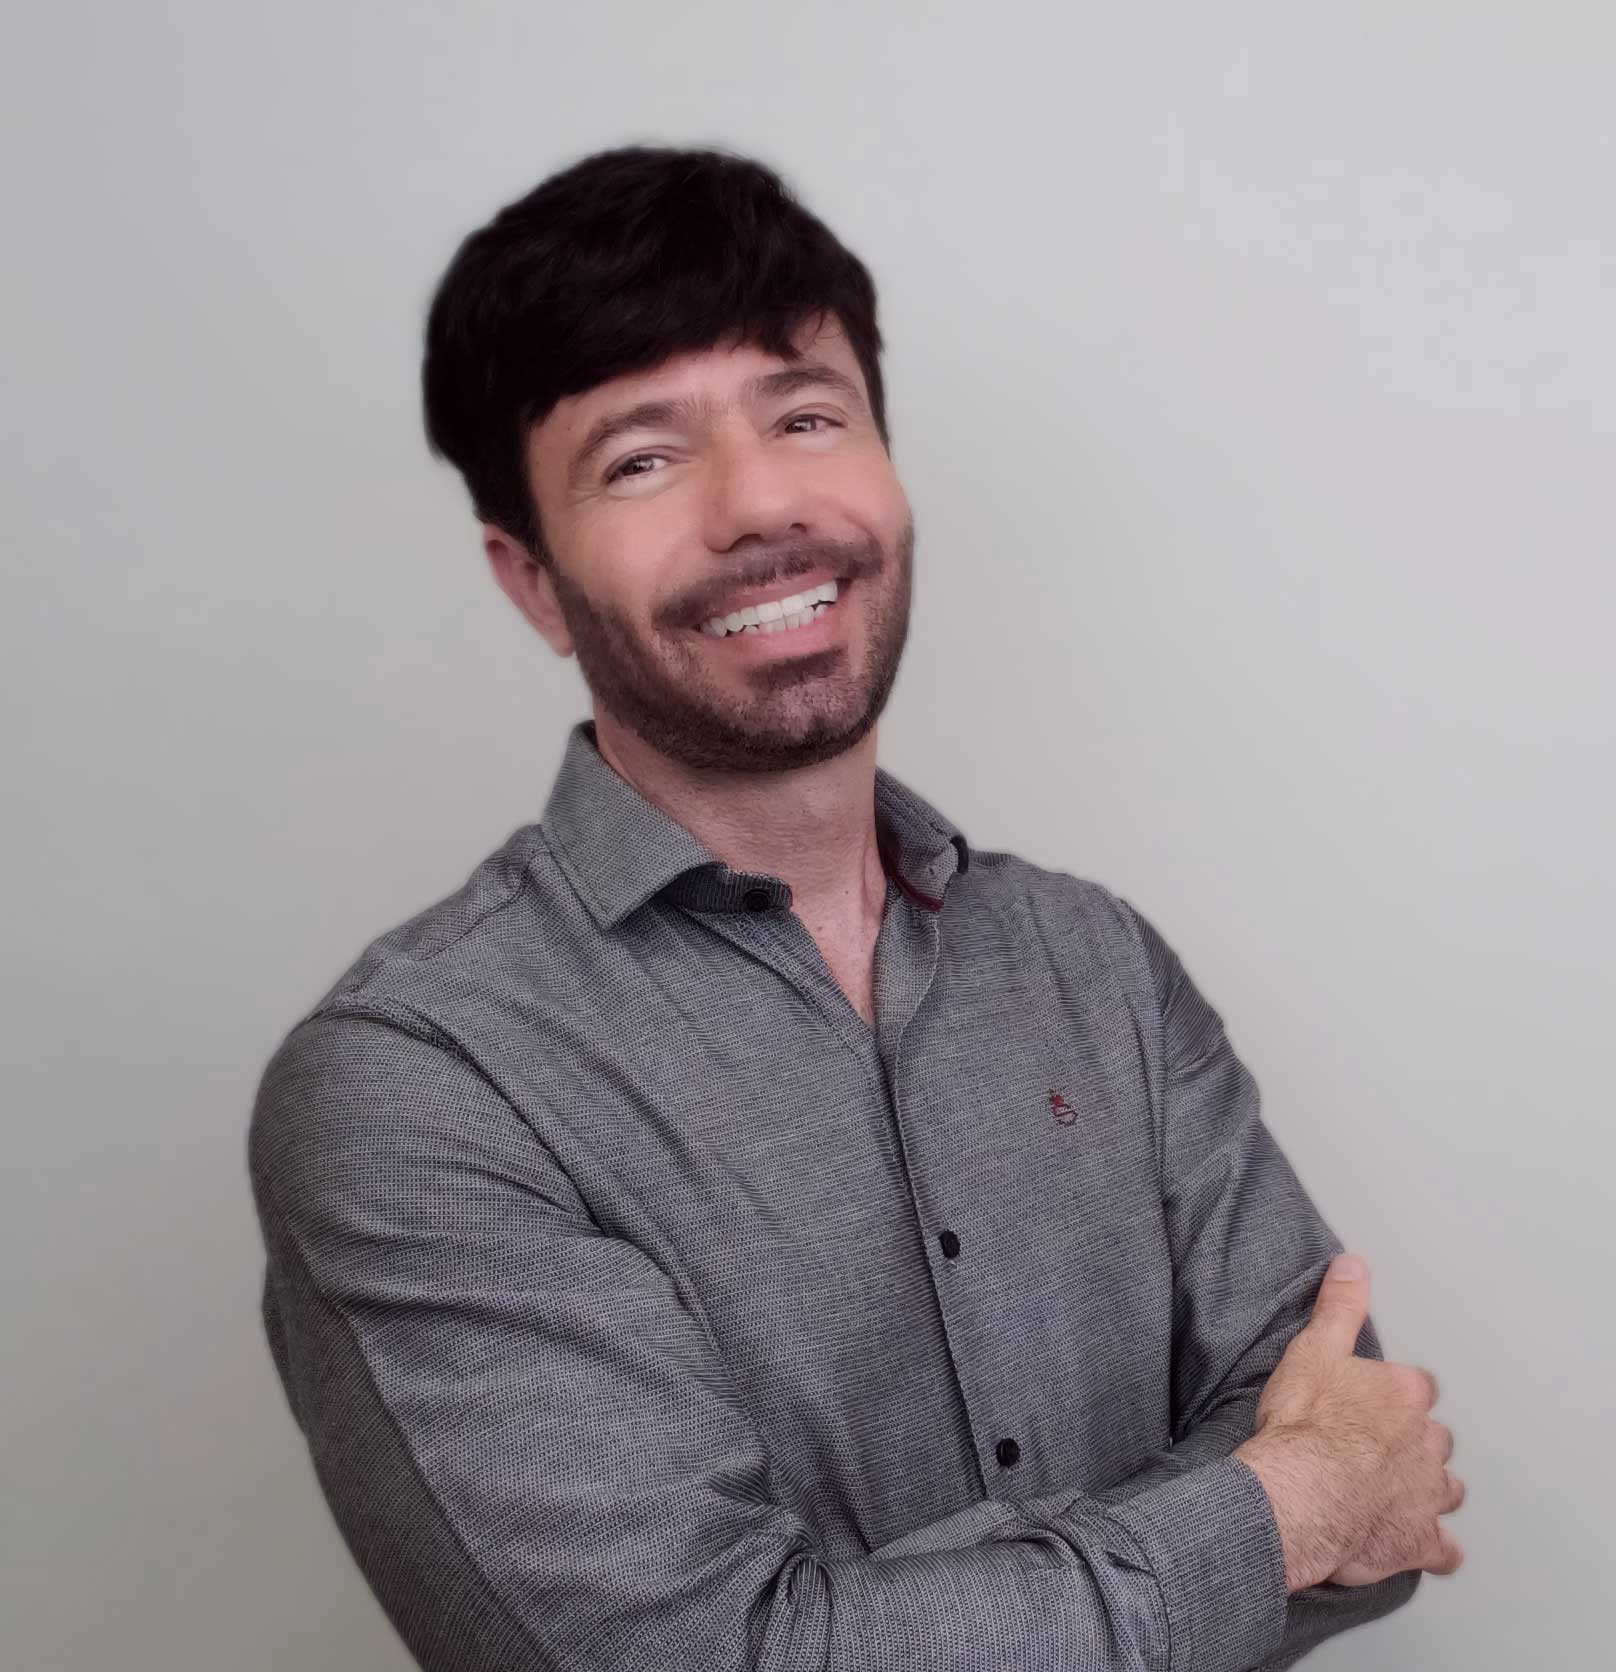 Rodrigo Sorrindo